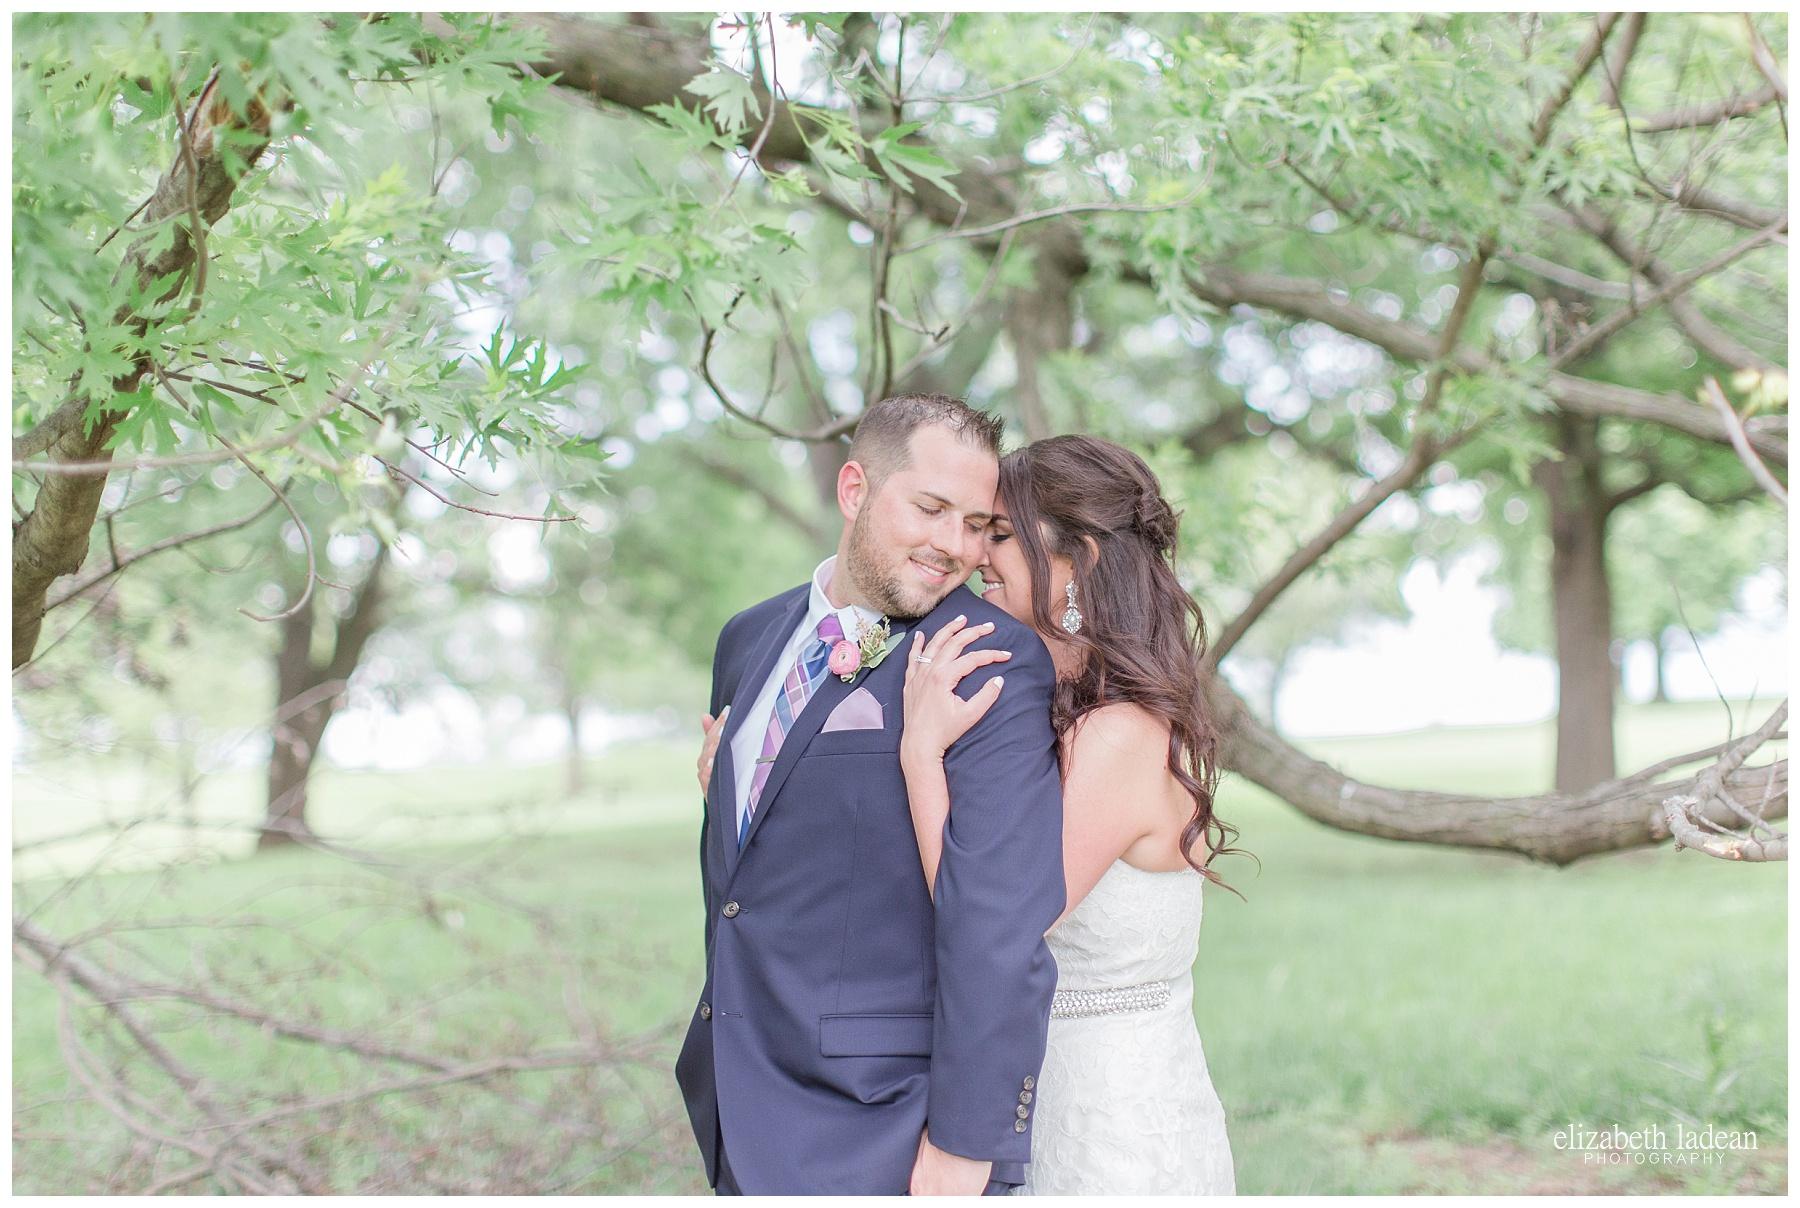 Hillcrest-Country-Club-Kansas-City-Wedding-Photography-E+J-0520-Elizabeth-Ladean-Photography-photo_0868.jpg